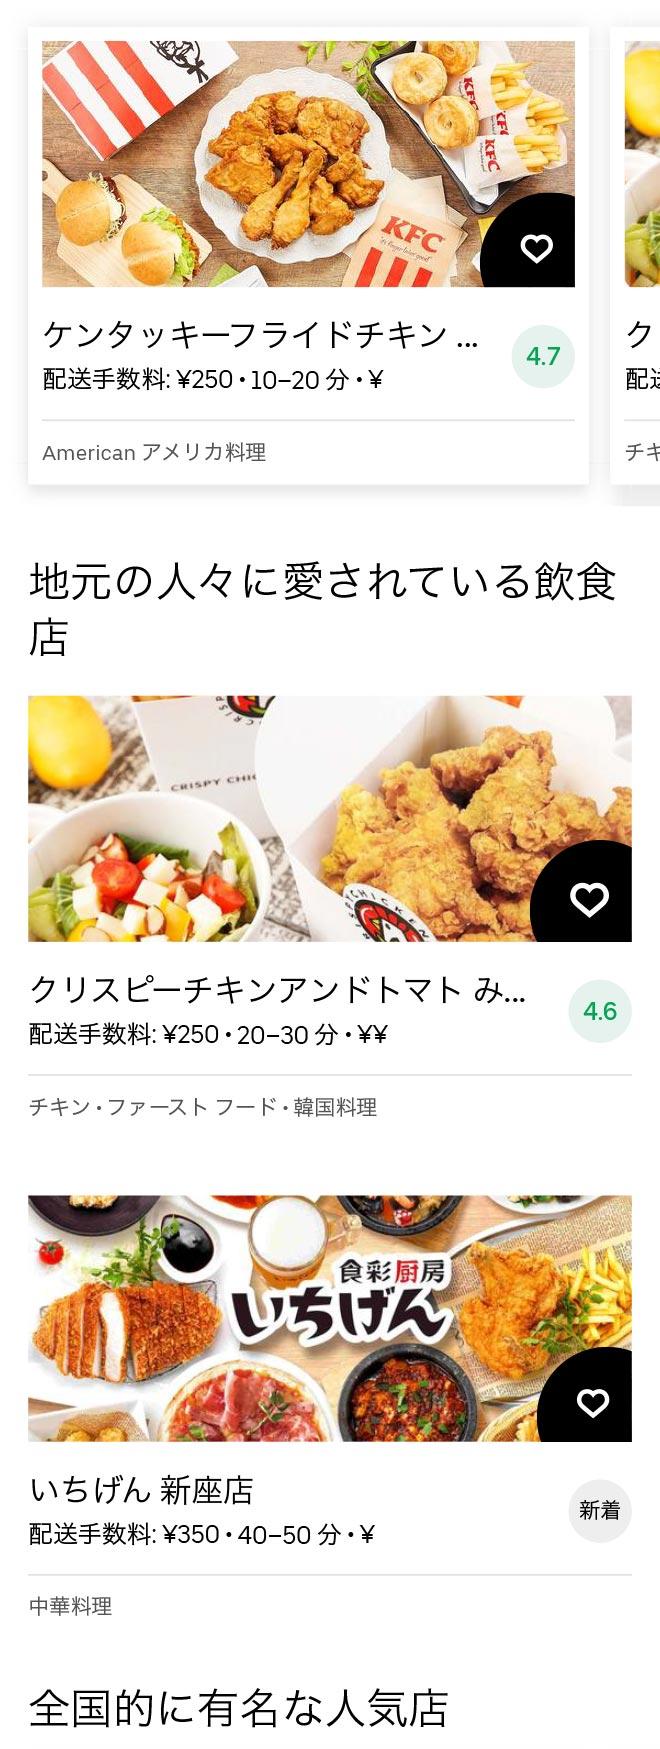 Yanasegawa menu 2011 01